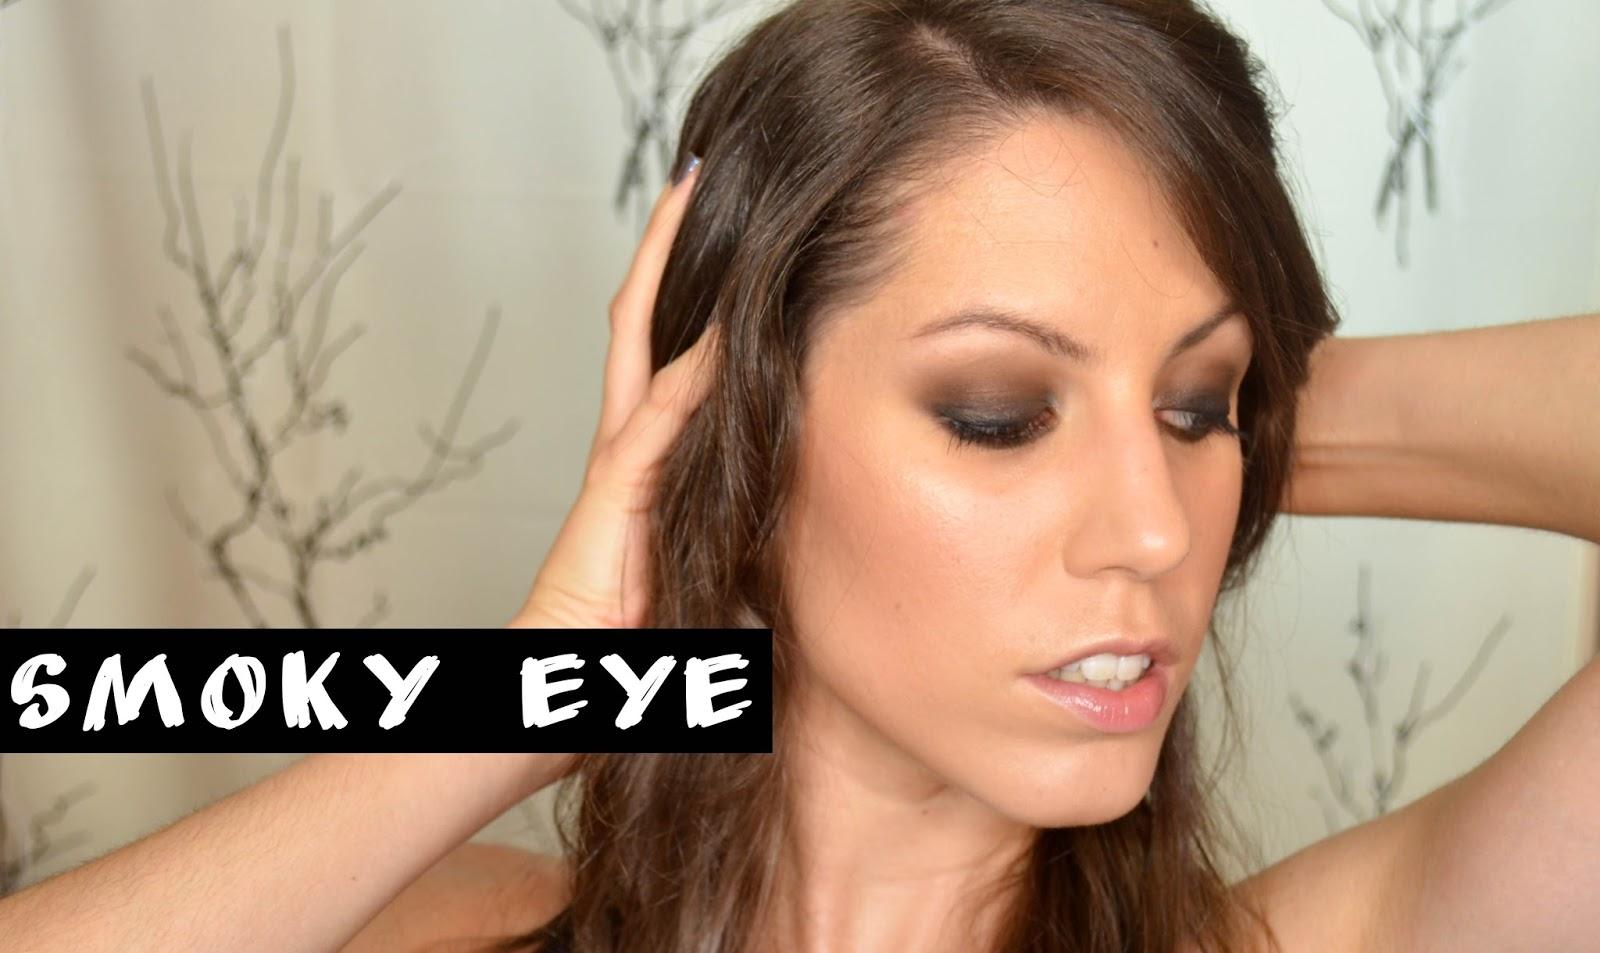 smoky eye smokey clasico negro makeup maquillaje ahumado rubibeauty